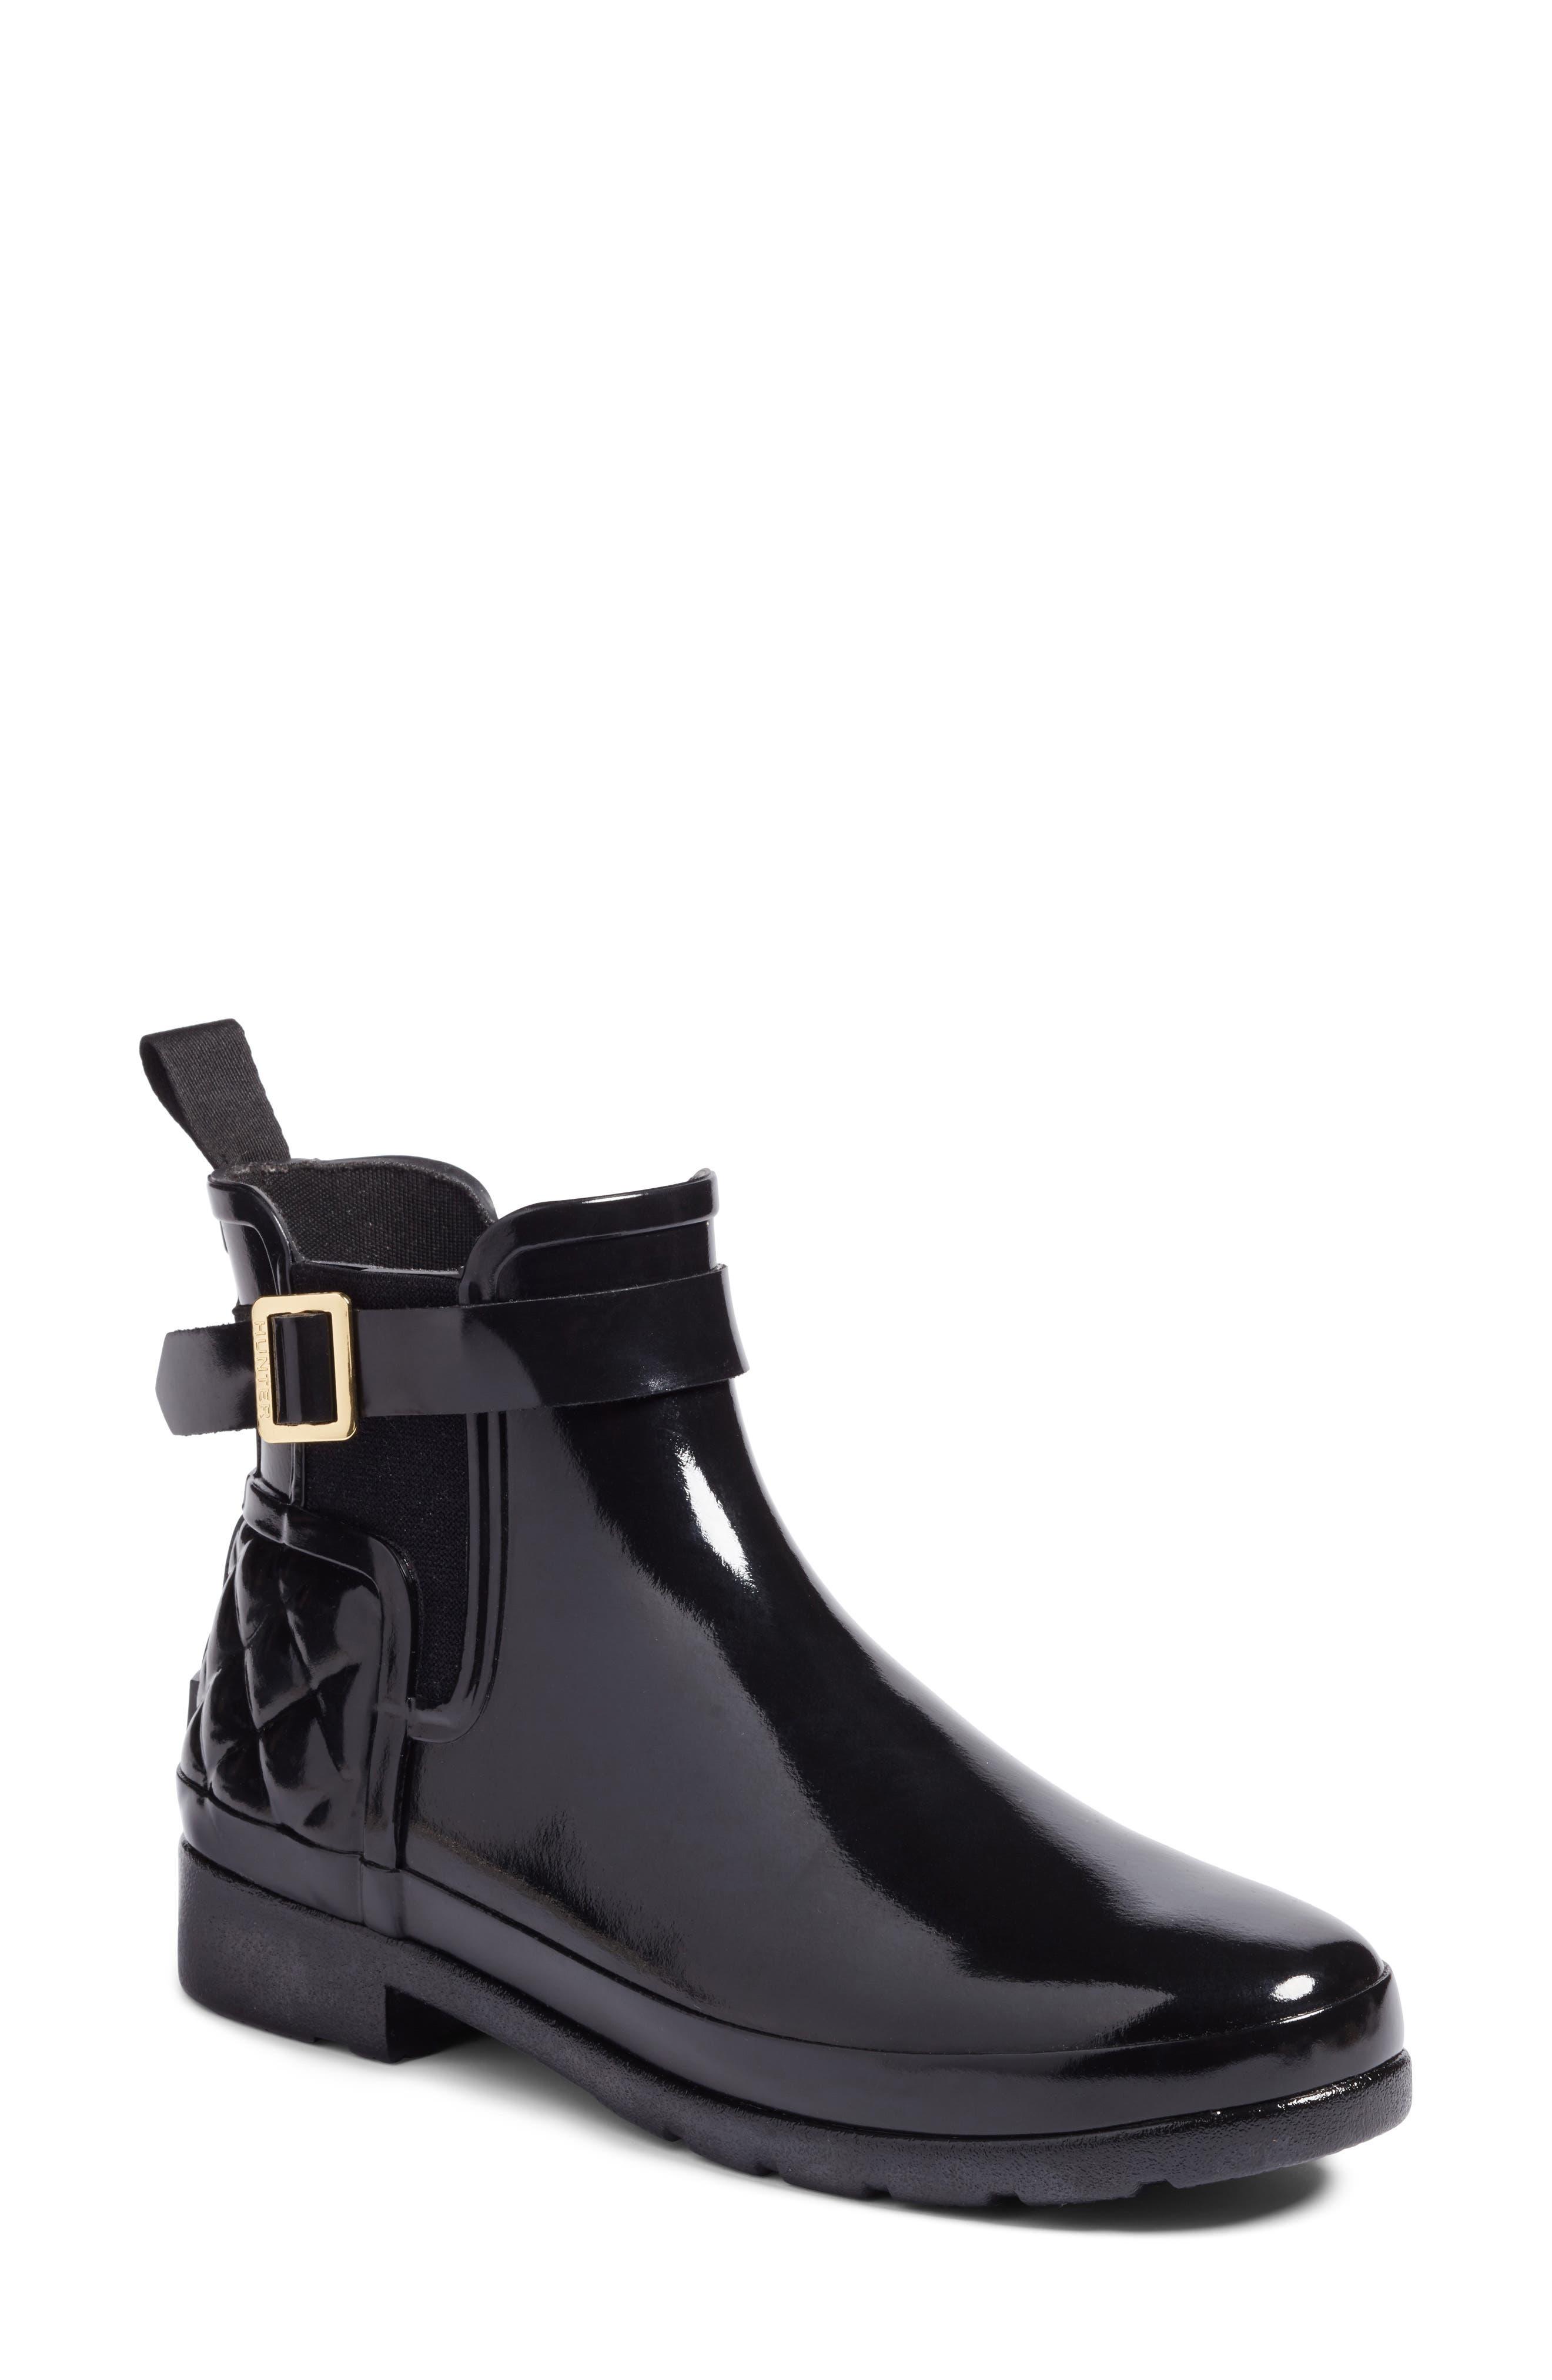 Hunter Original Refined Quilted Gloss Chelsea Waterproof Boot, Black